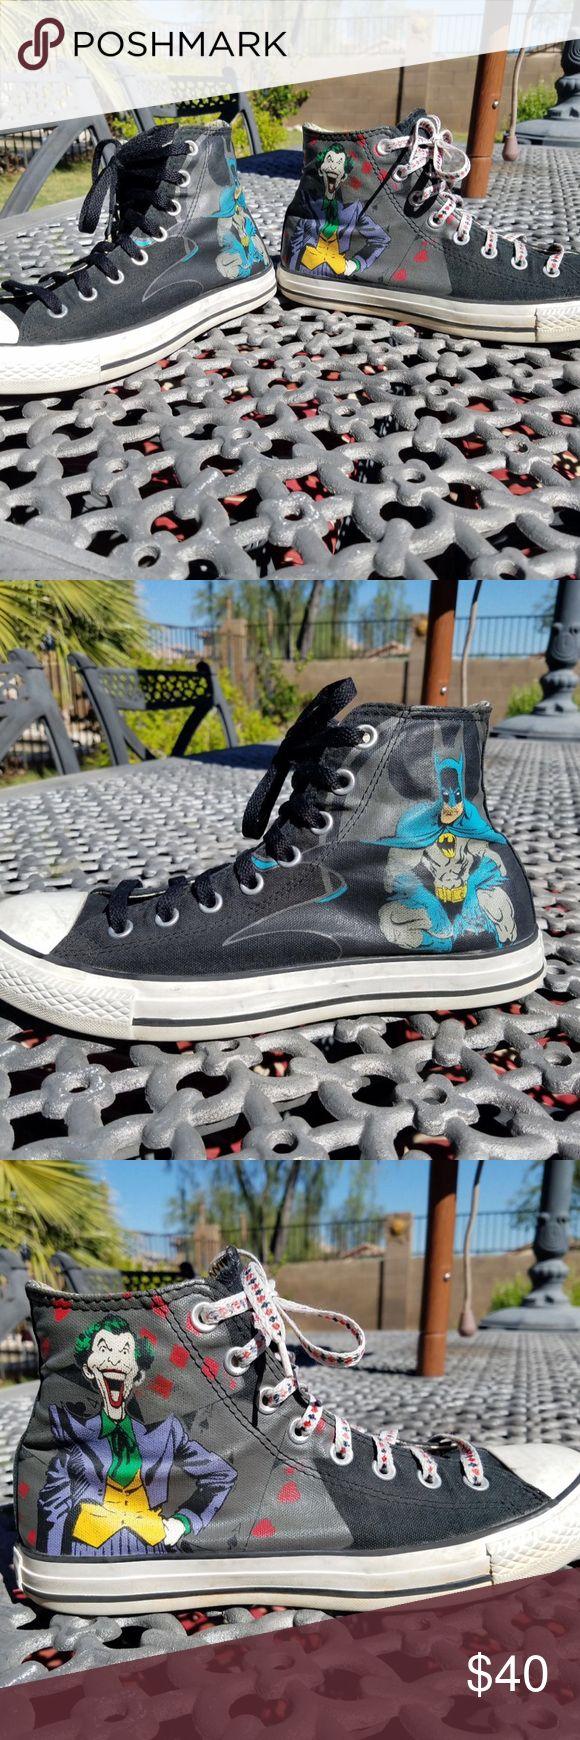 Converse DC Comics Batman/ Joker size 8M/ 10W Nice condition Converse Shoes Sneakers